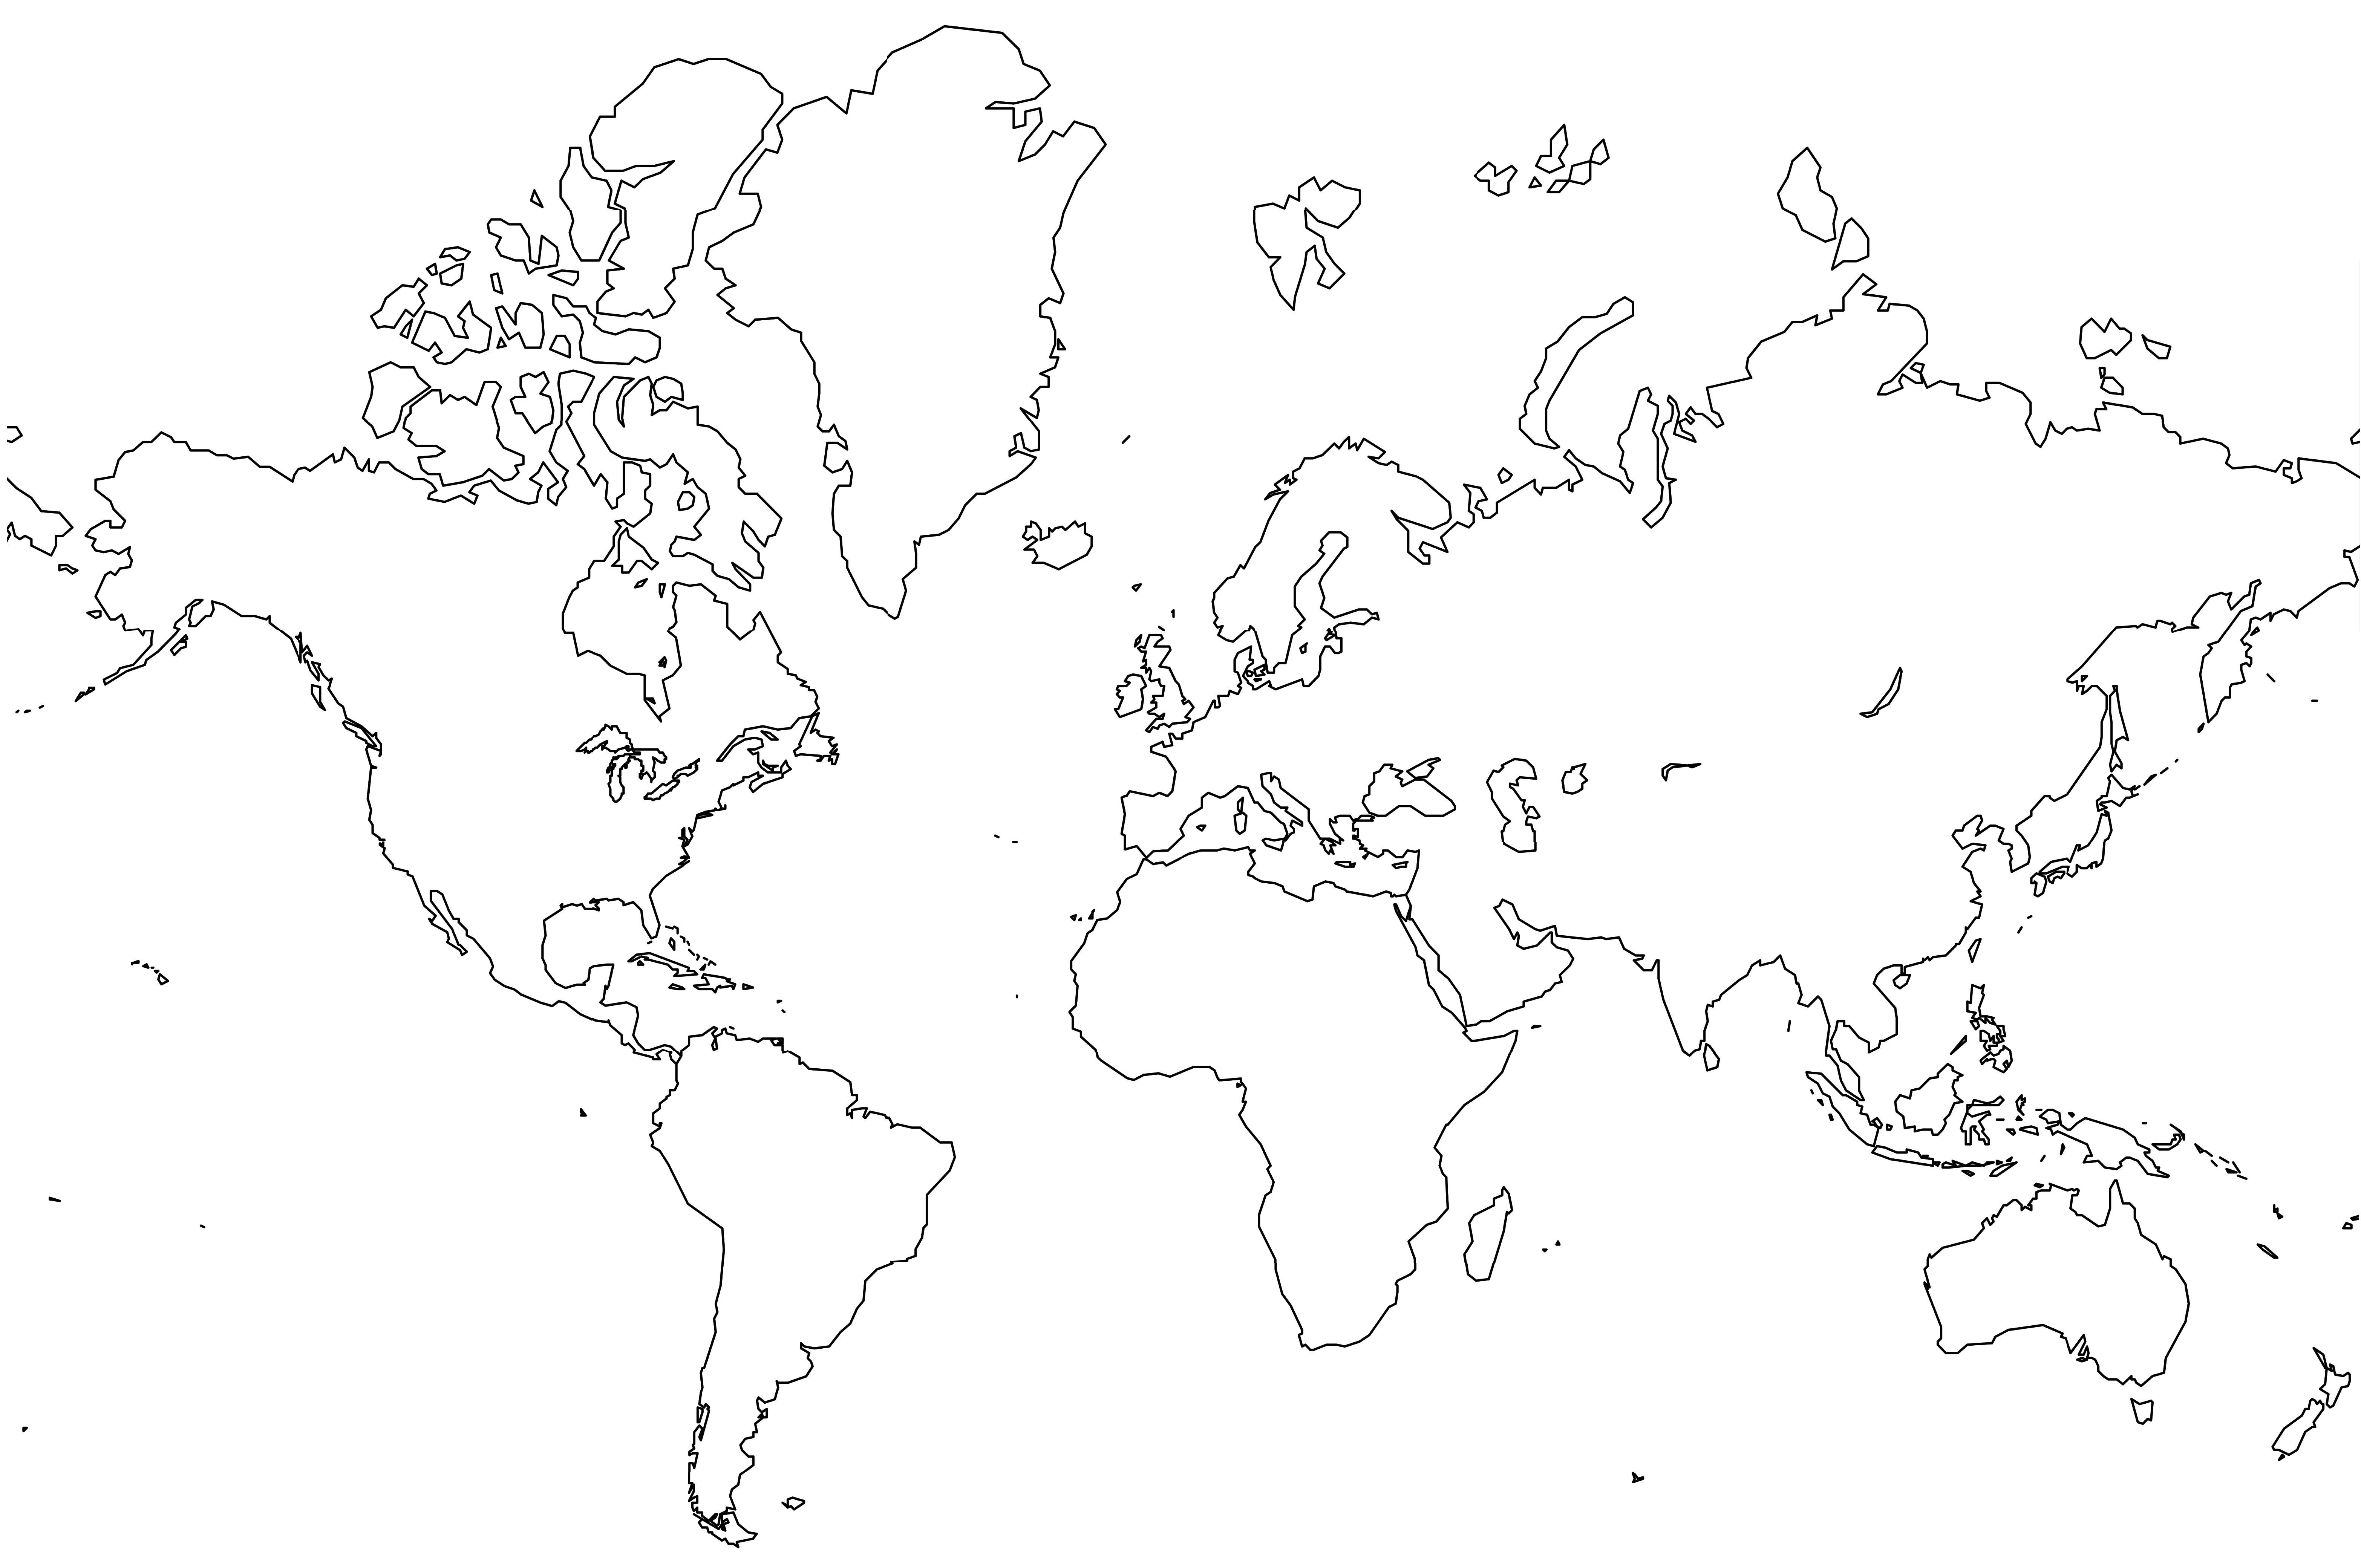 Bigworldmapjpg Map Pictures - World map blank printable